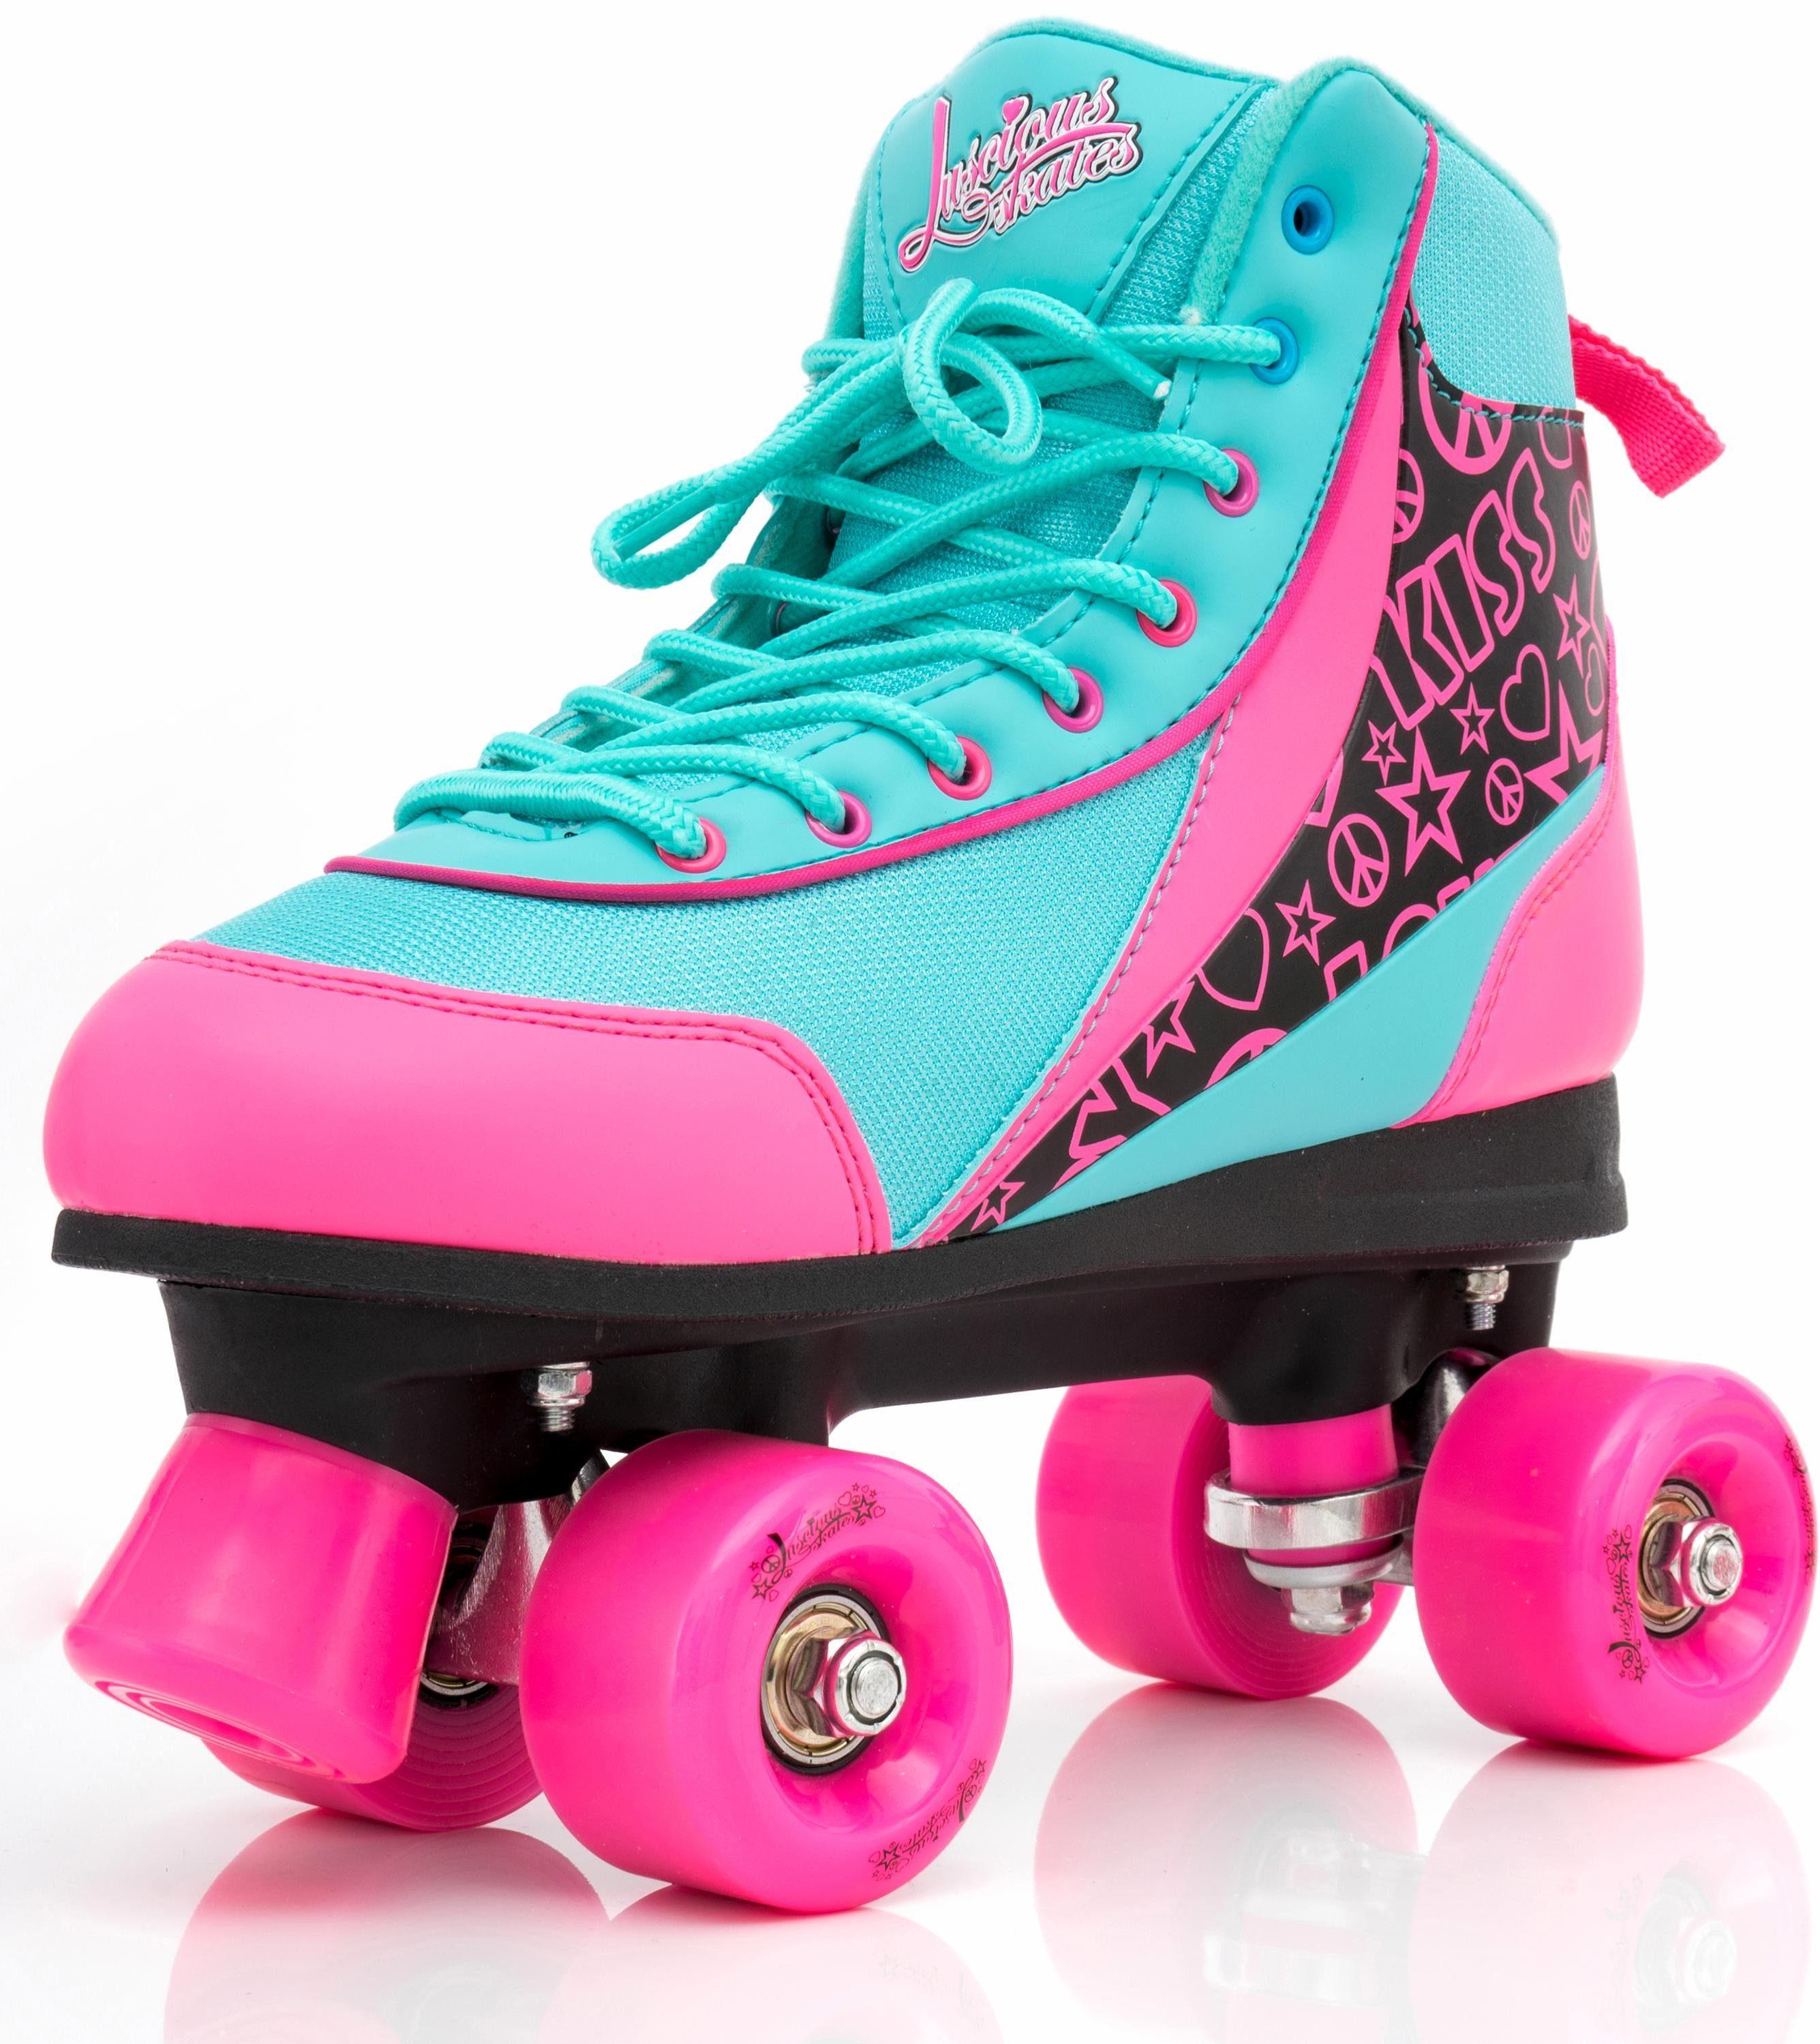 Luscious Skates Rollschuhe Summer Days kaufen  OTTO